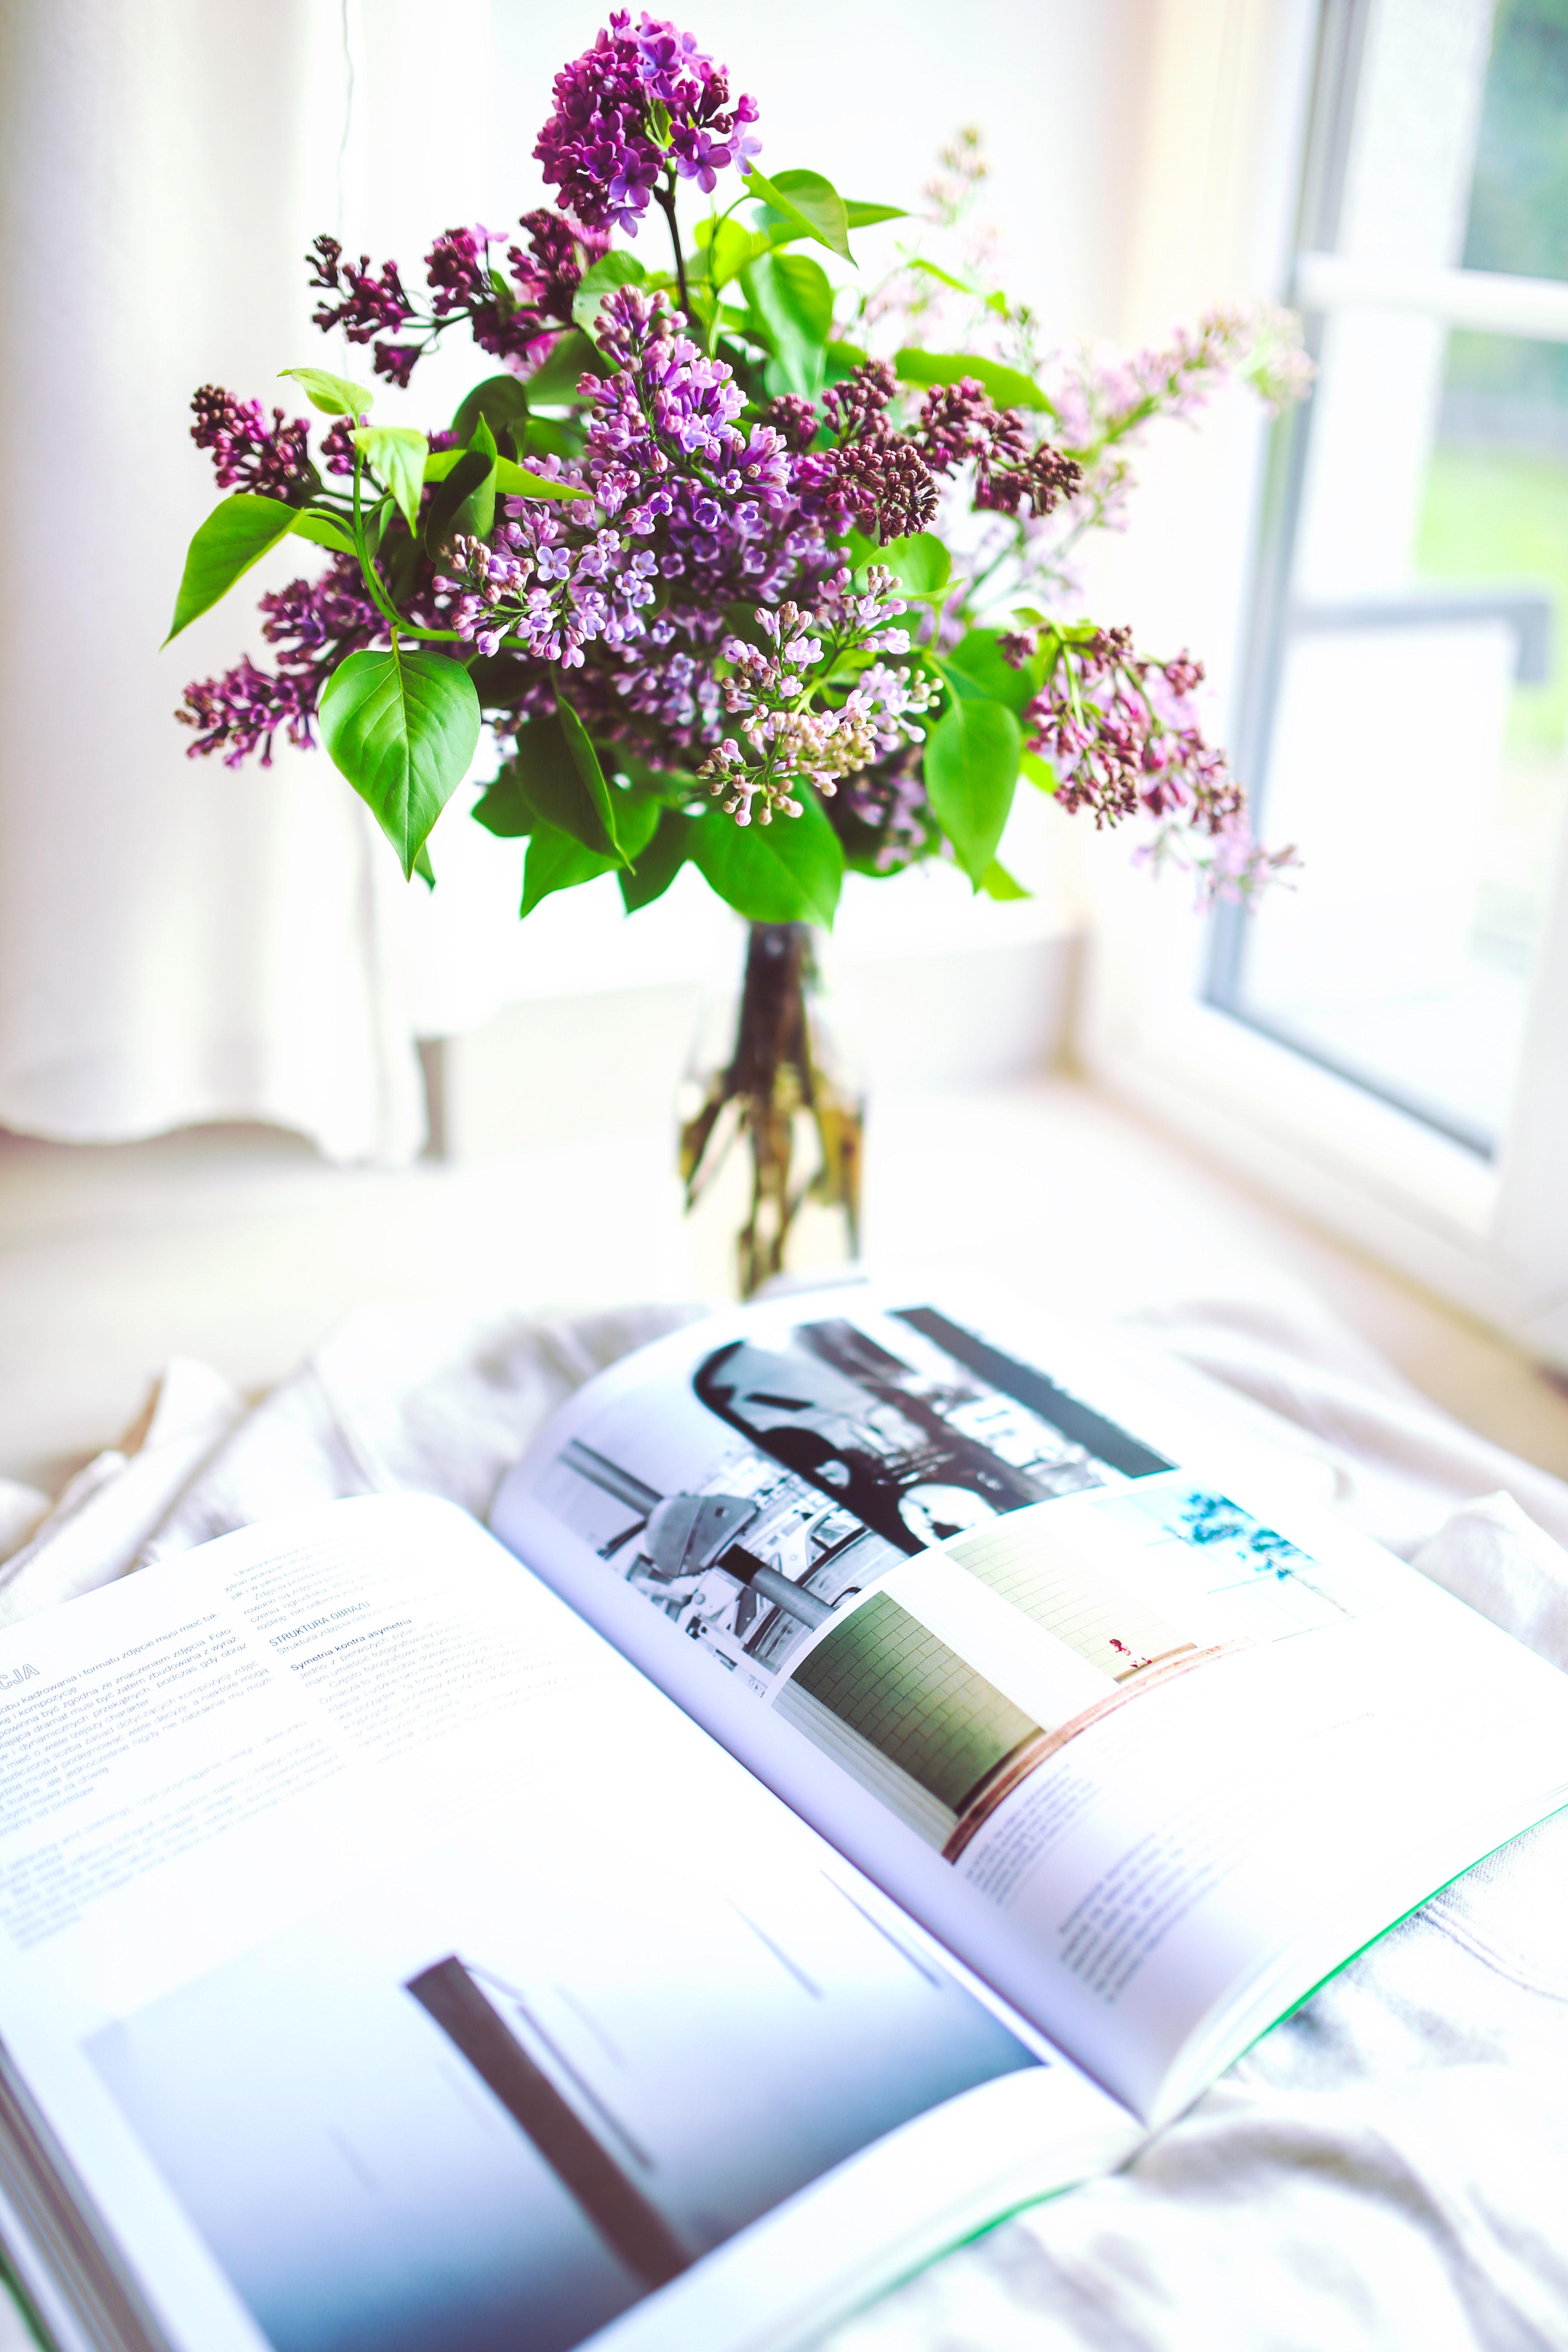 Sambucus / elder / elderberry, Indoors, Violet, Vase, Tree, HQ Photo